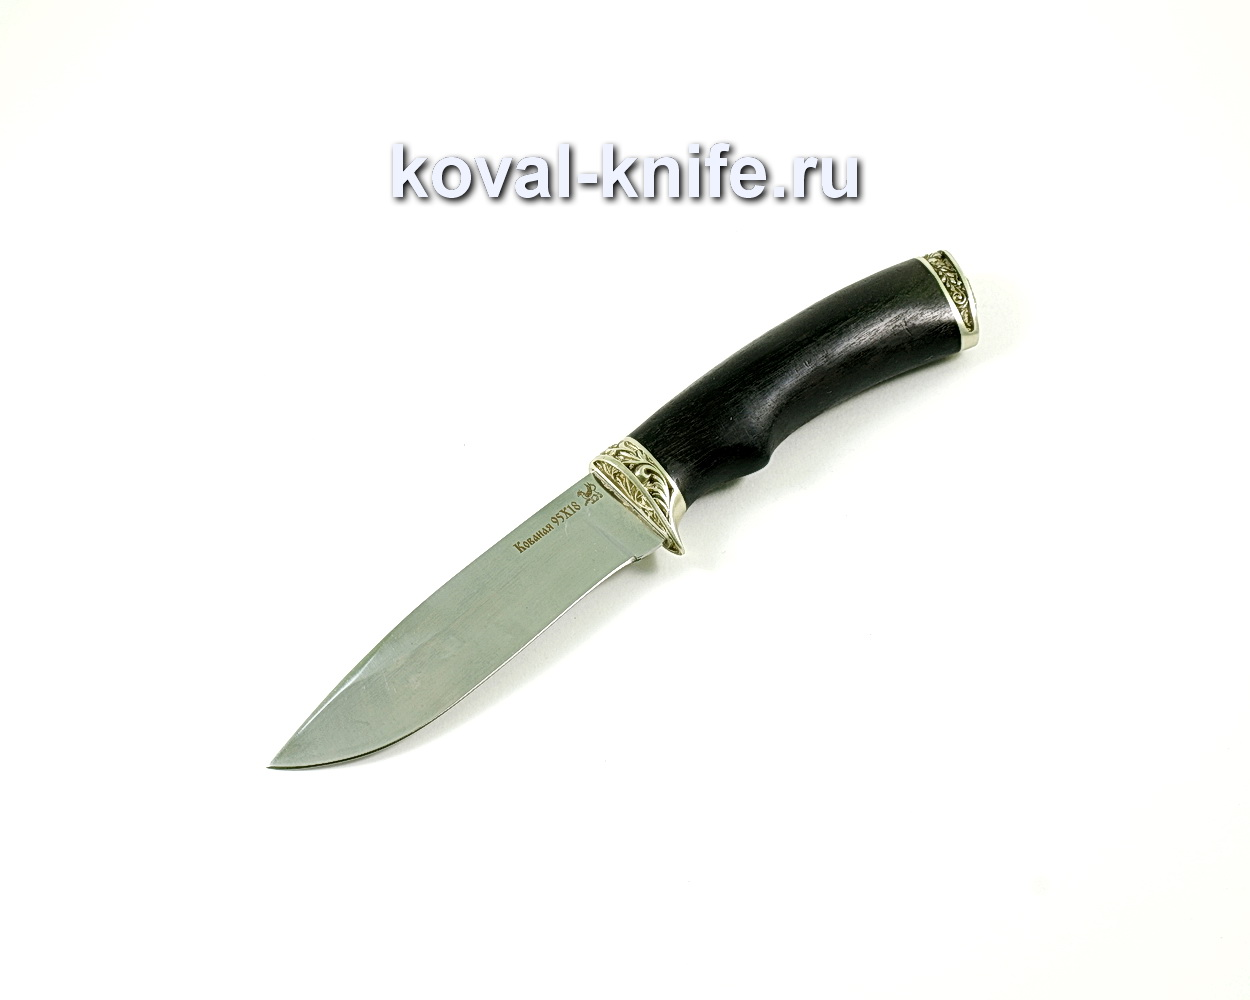 Нож Олимп (сталь 95х18), рукоять граб, литье A239